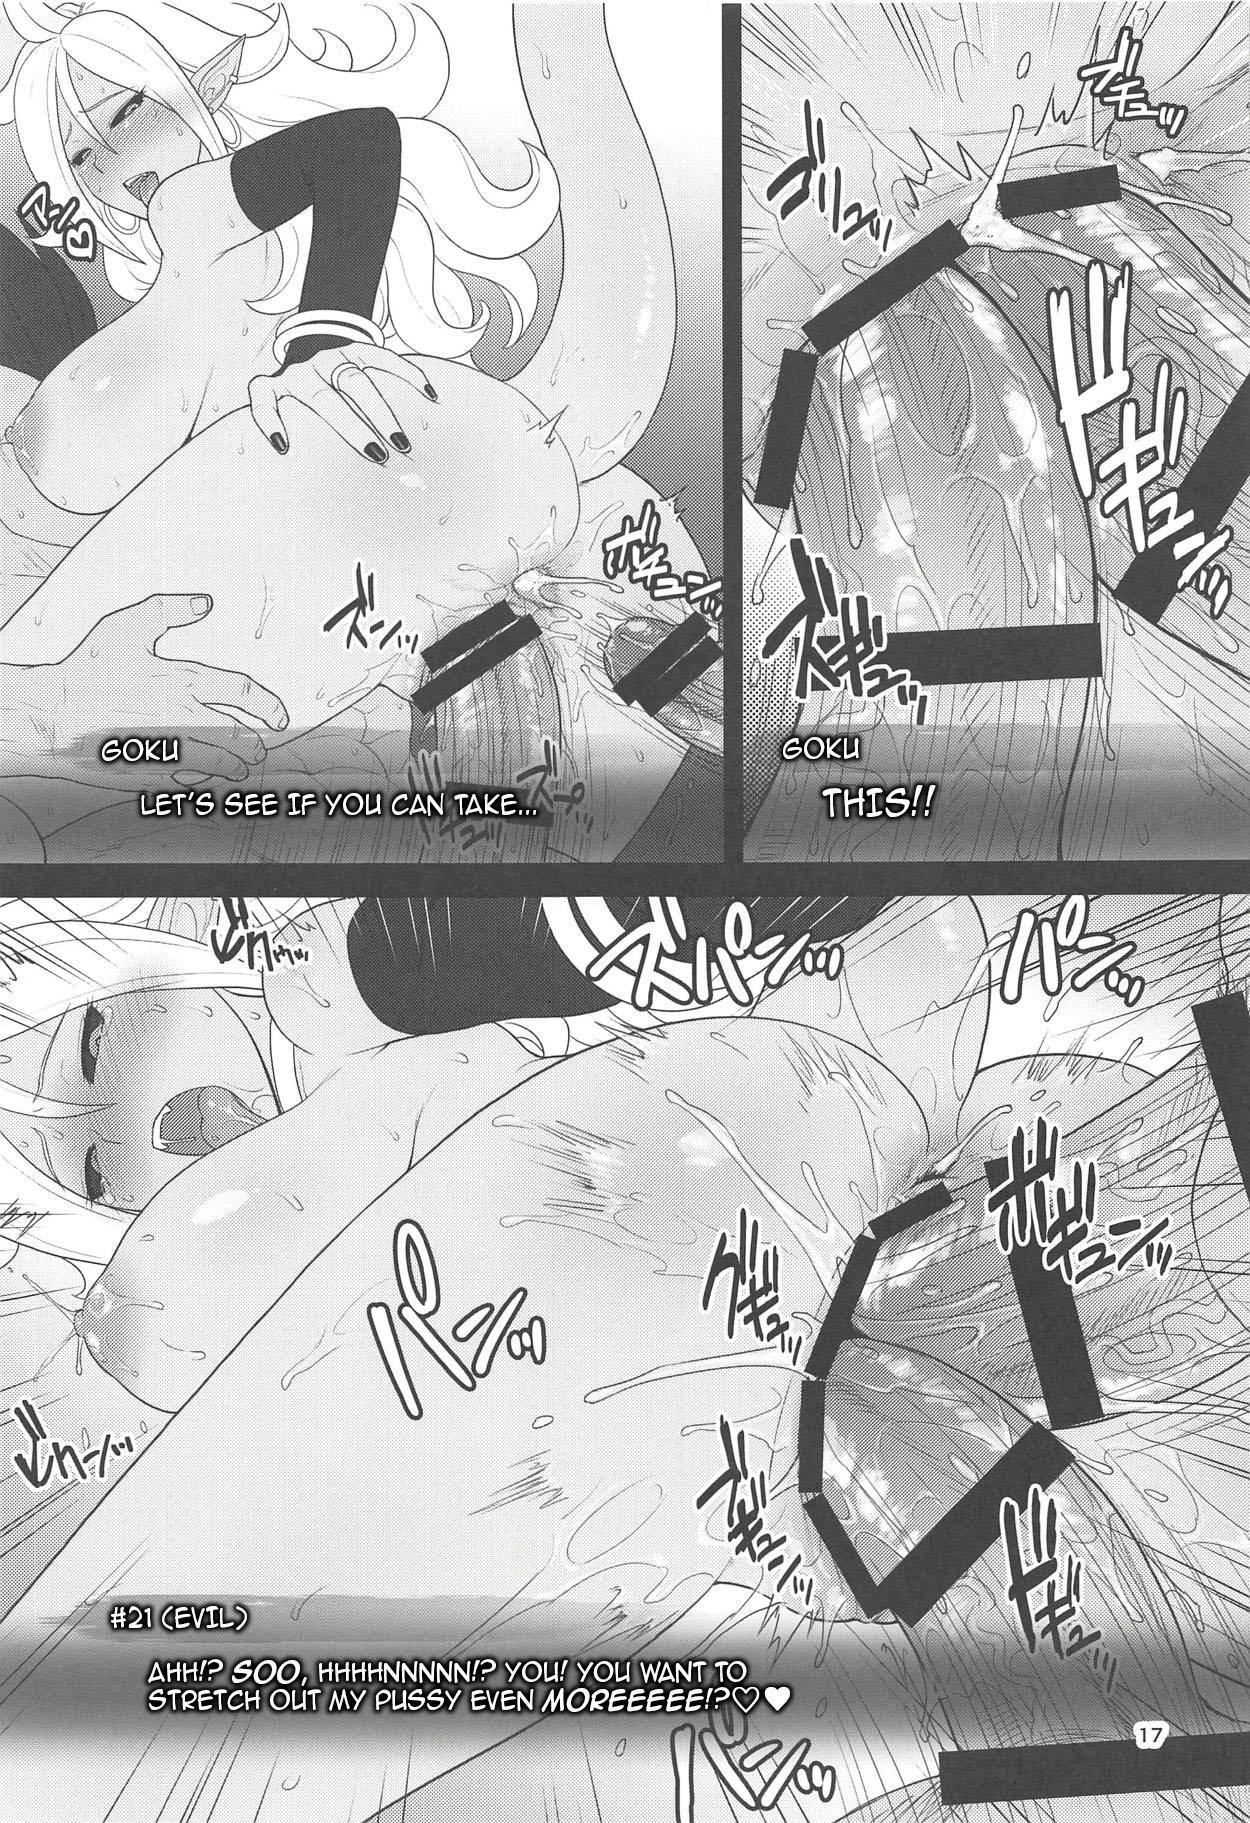 (C94) [Shinnihon Pepsitou (St.germain-sal)] 1-tsubu de 2-do Oishii | 2 for 1 Delicious Fun (Dragon Ball FighterZ) [English] {darknight} 15